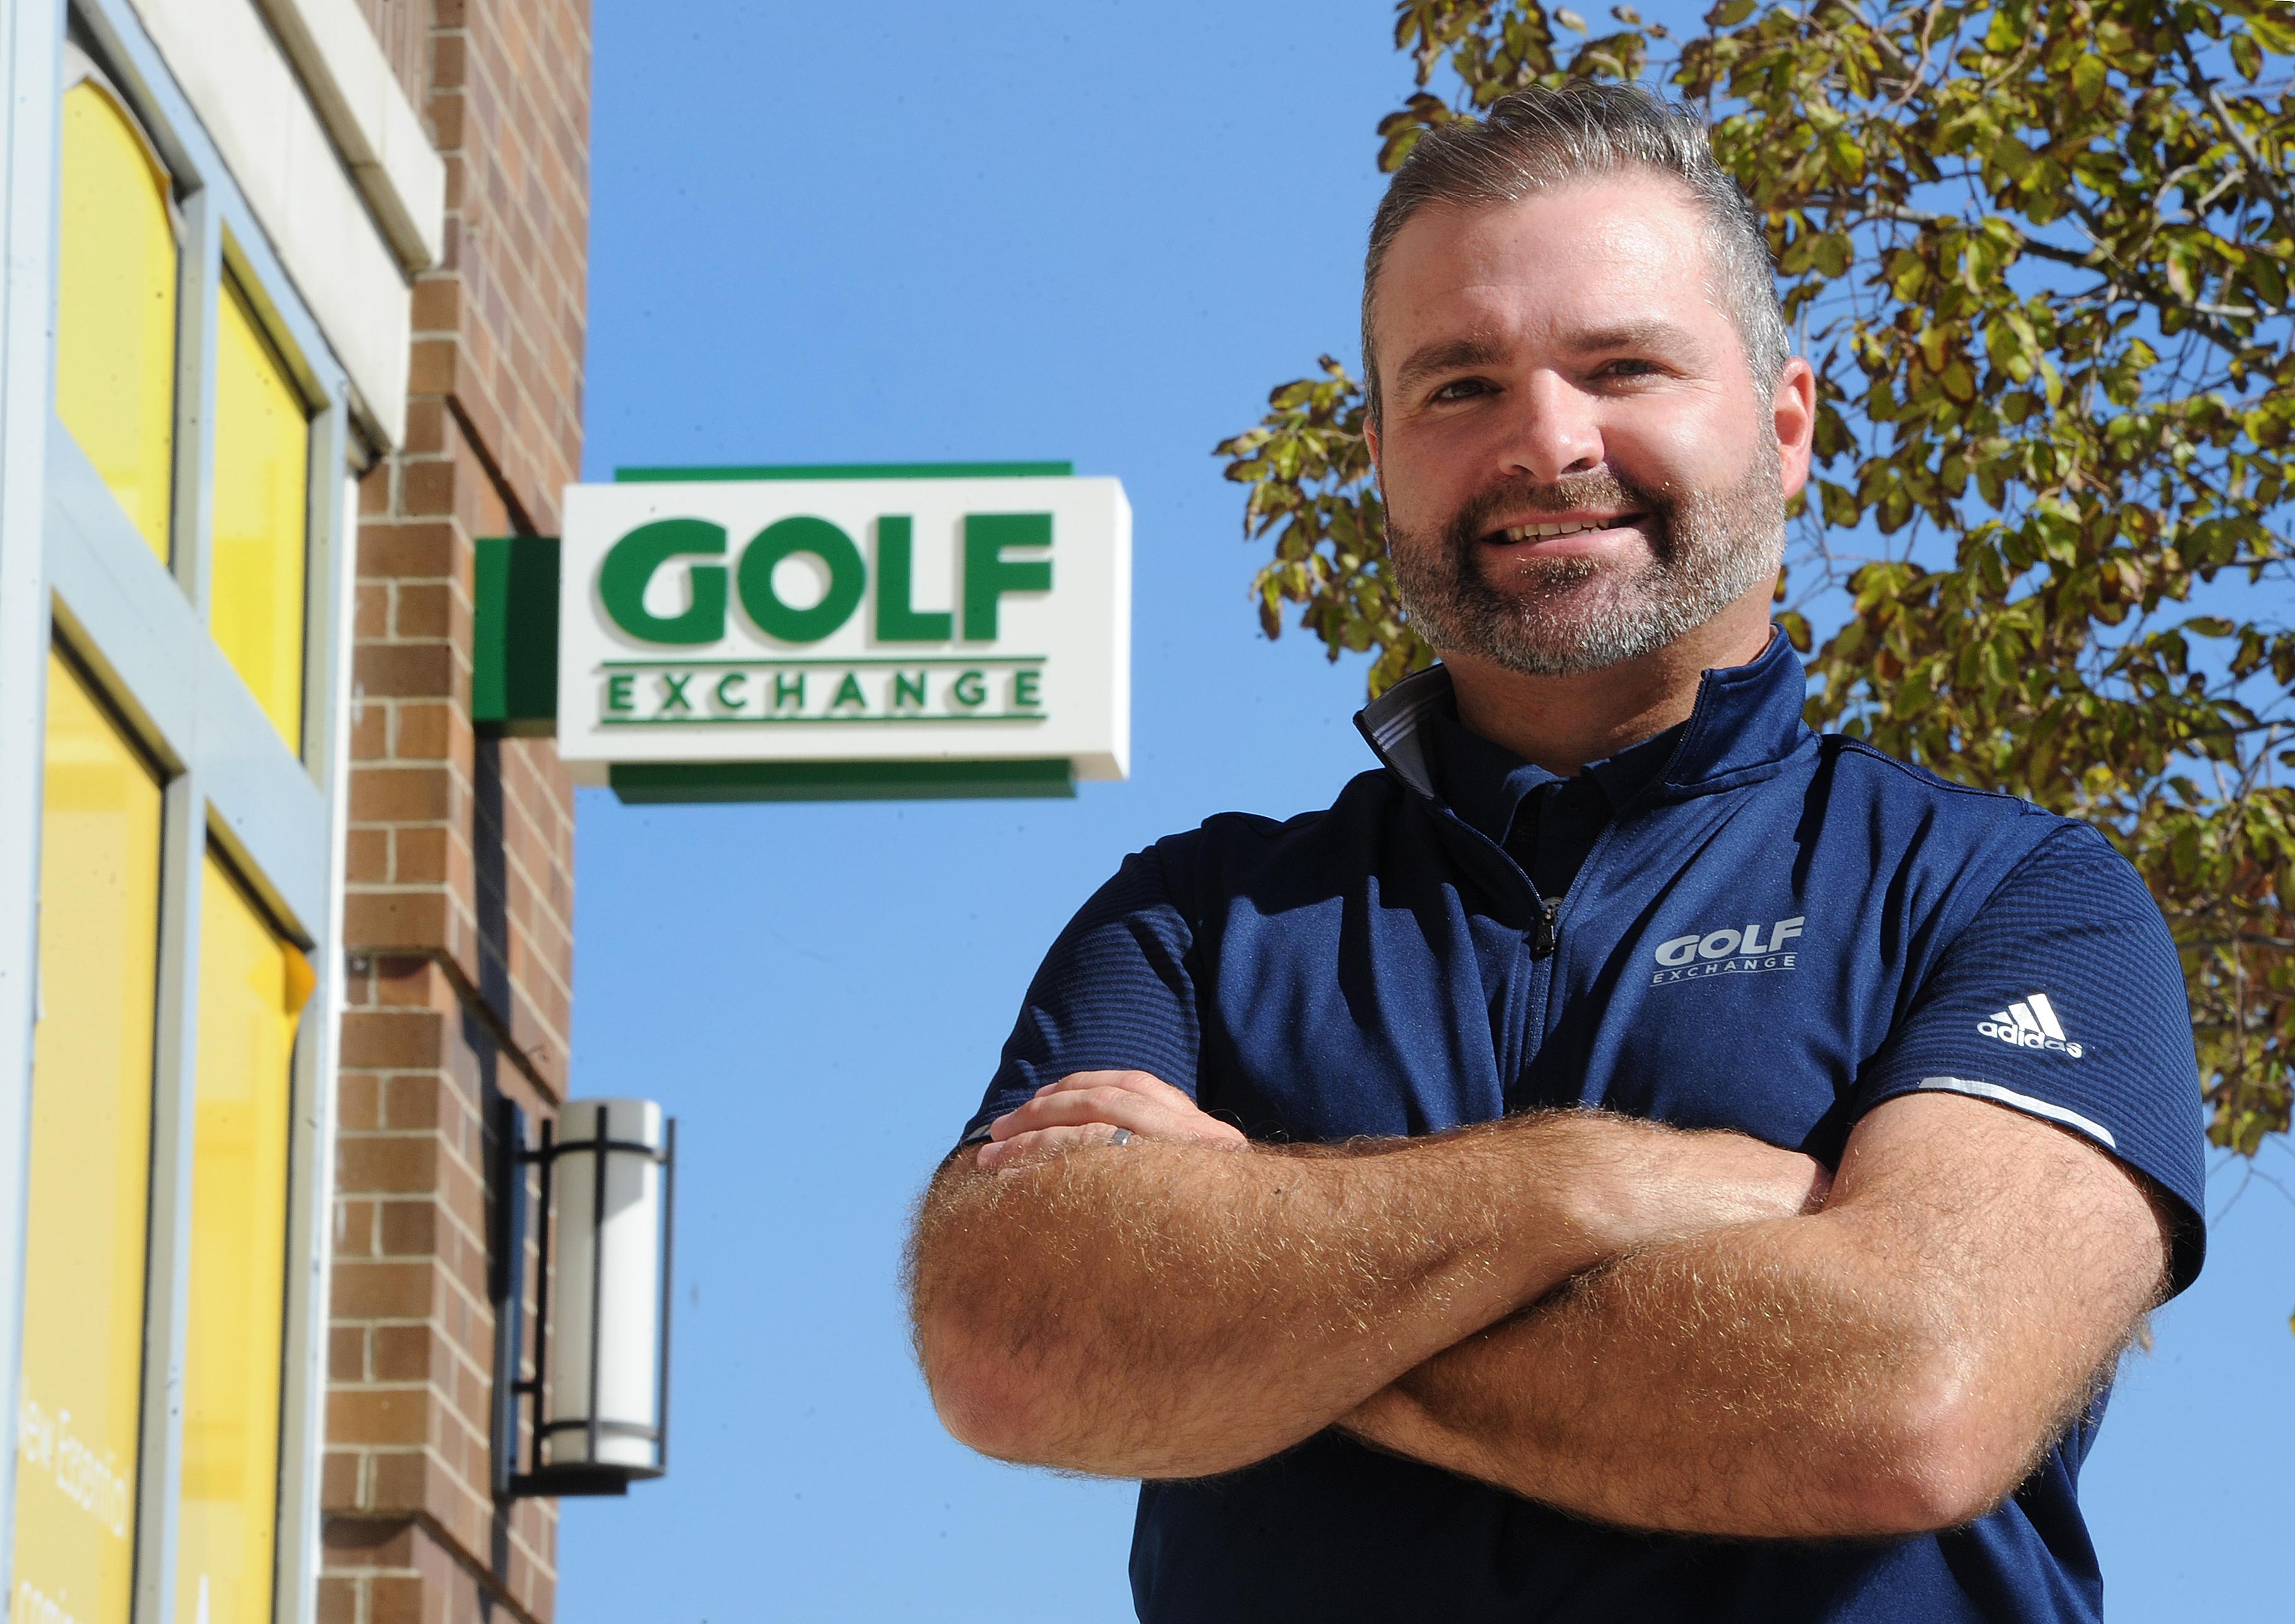 daytondailynews.com - Eric Schwartzberg - Cincinnati golf retailer expanding footprint into Dayton area